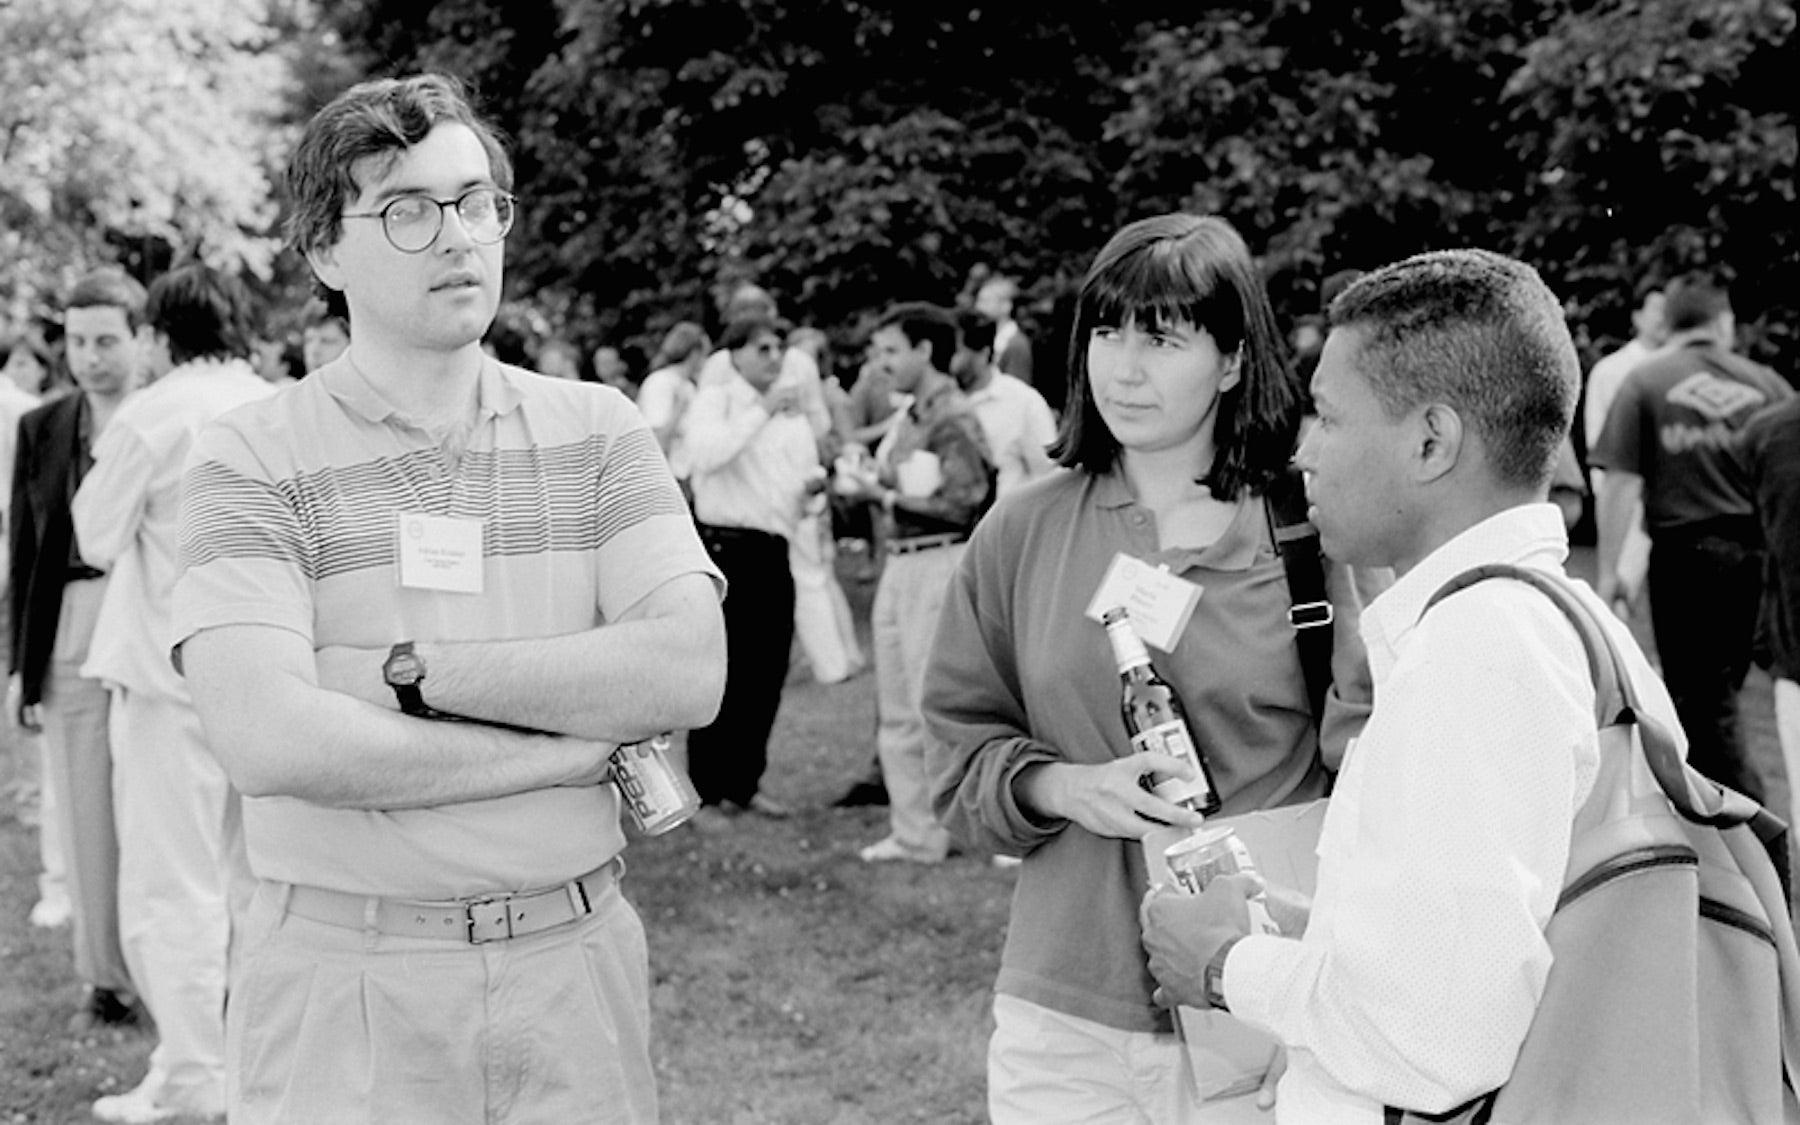 Adrian Krainer 1993